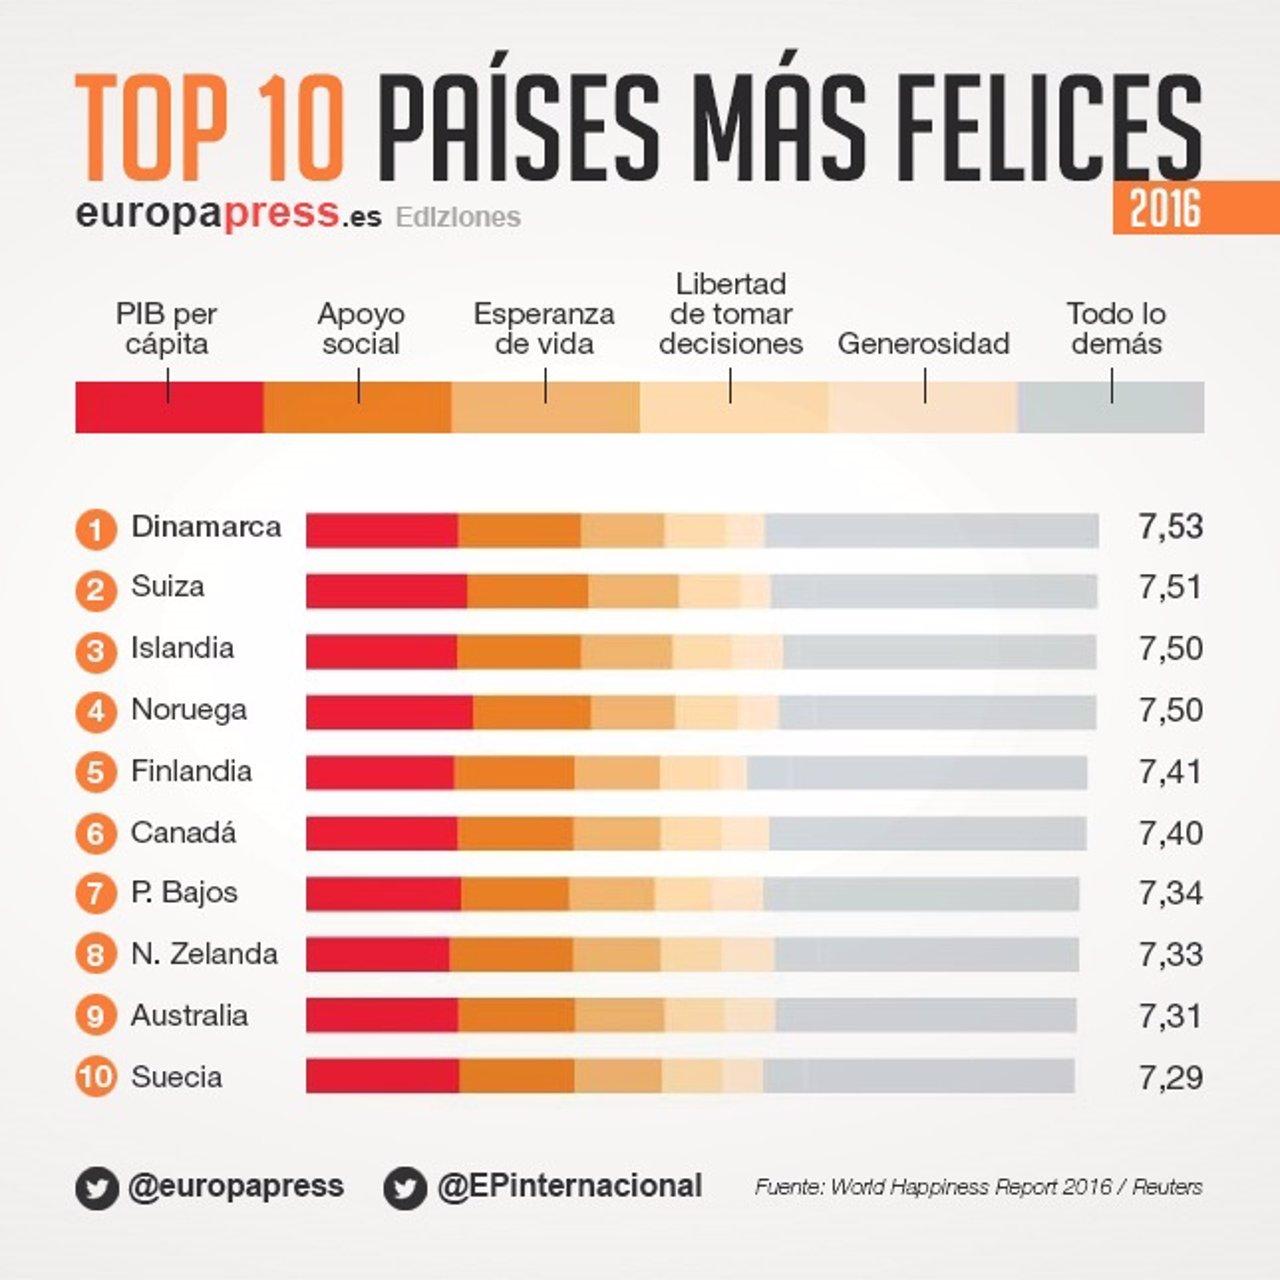 Top 10 Paises Mas Felices